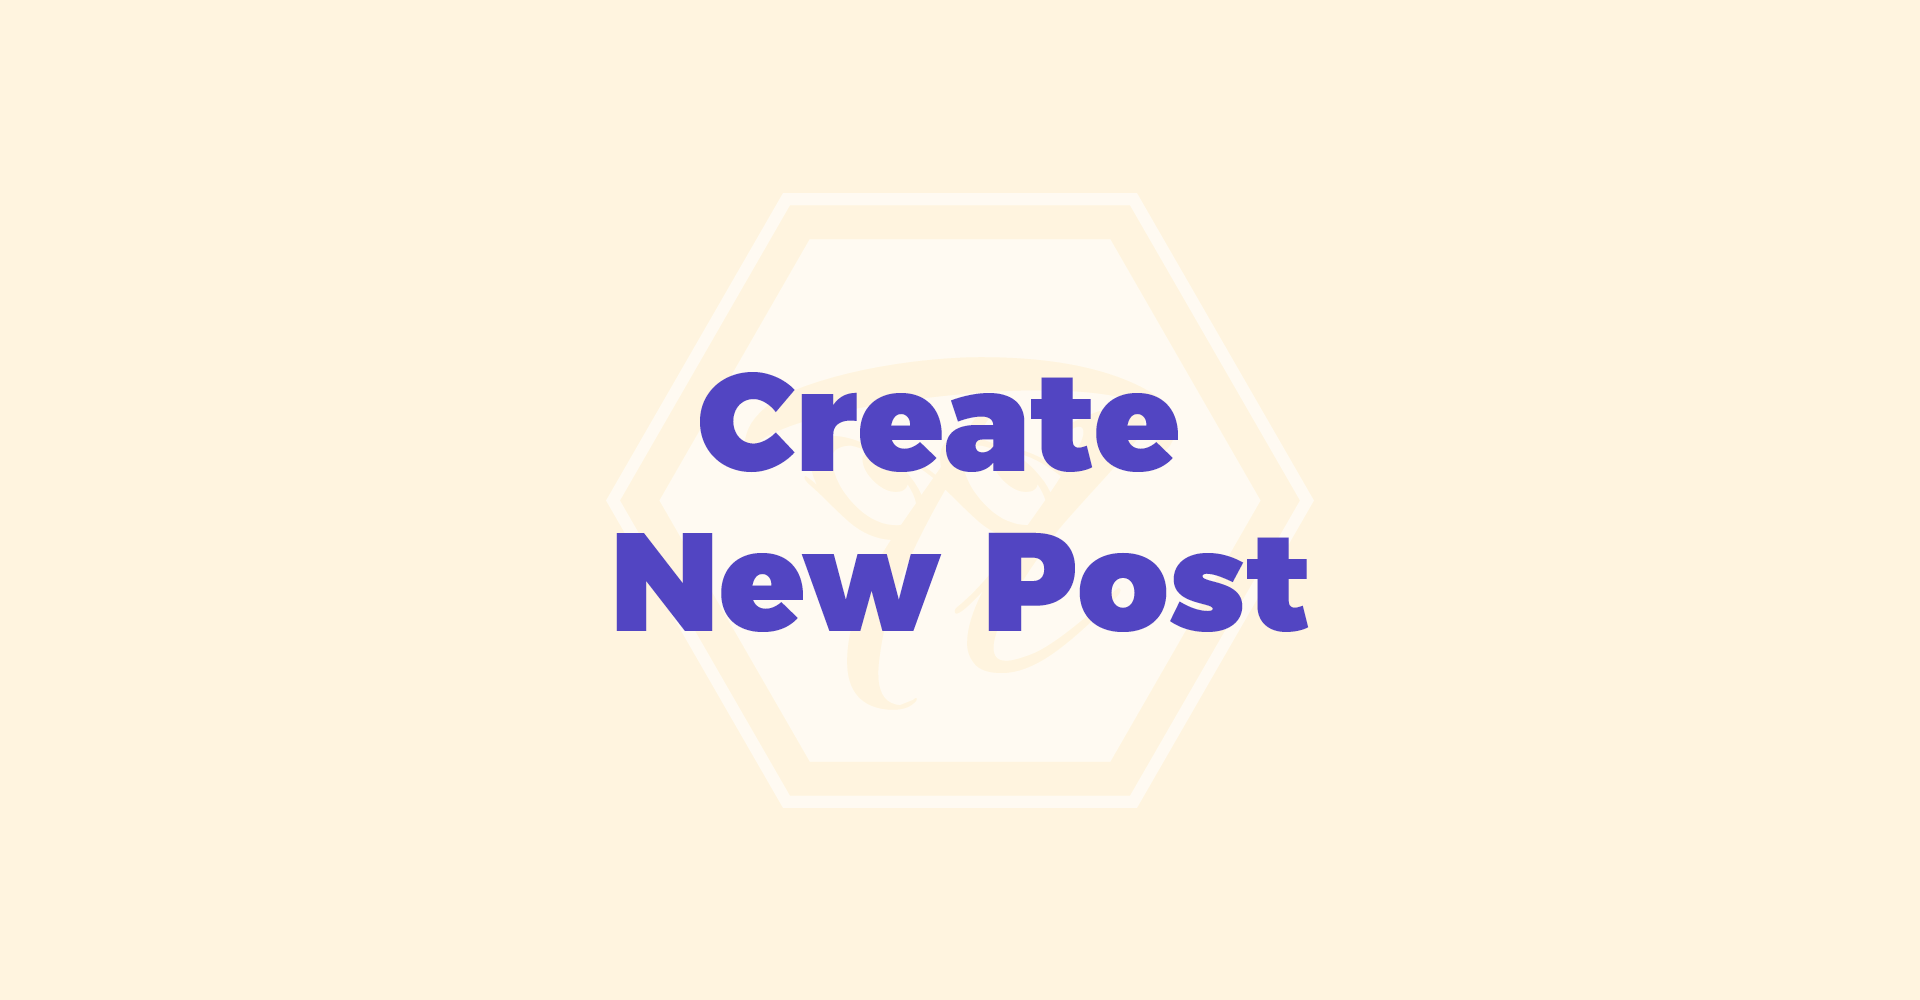 create__new_post 1